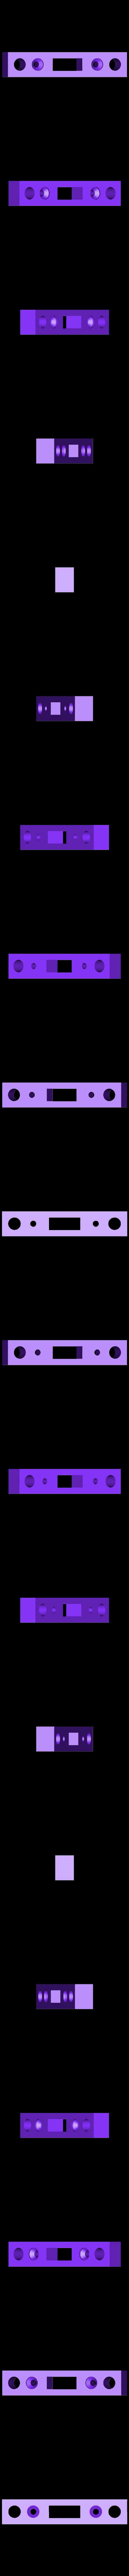 coupling_bottom.stl Download free STL file USB Microscope stand - very rigid, two axis • 3D printable template, maciejkobuszewski